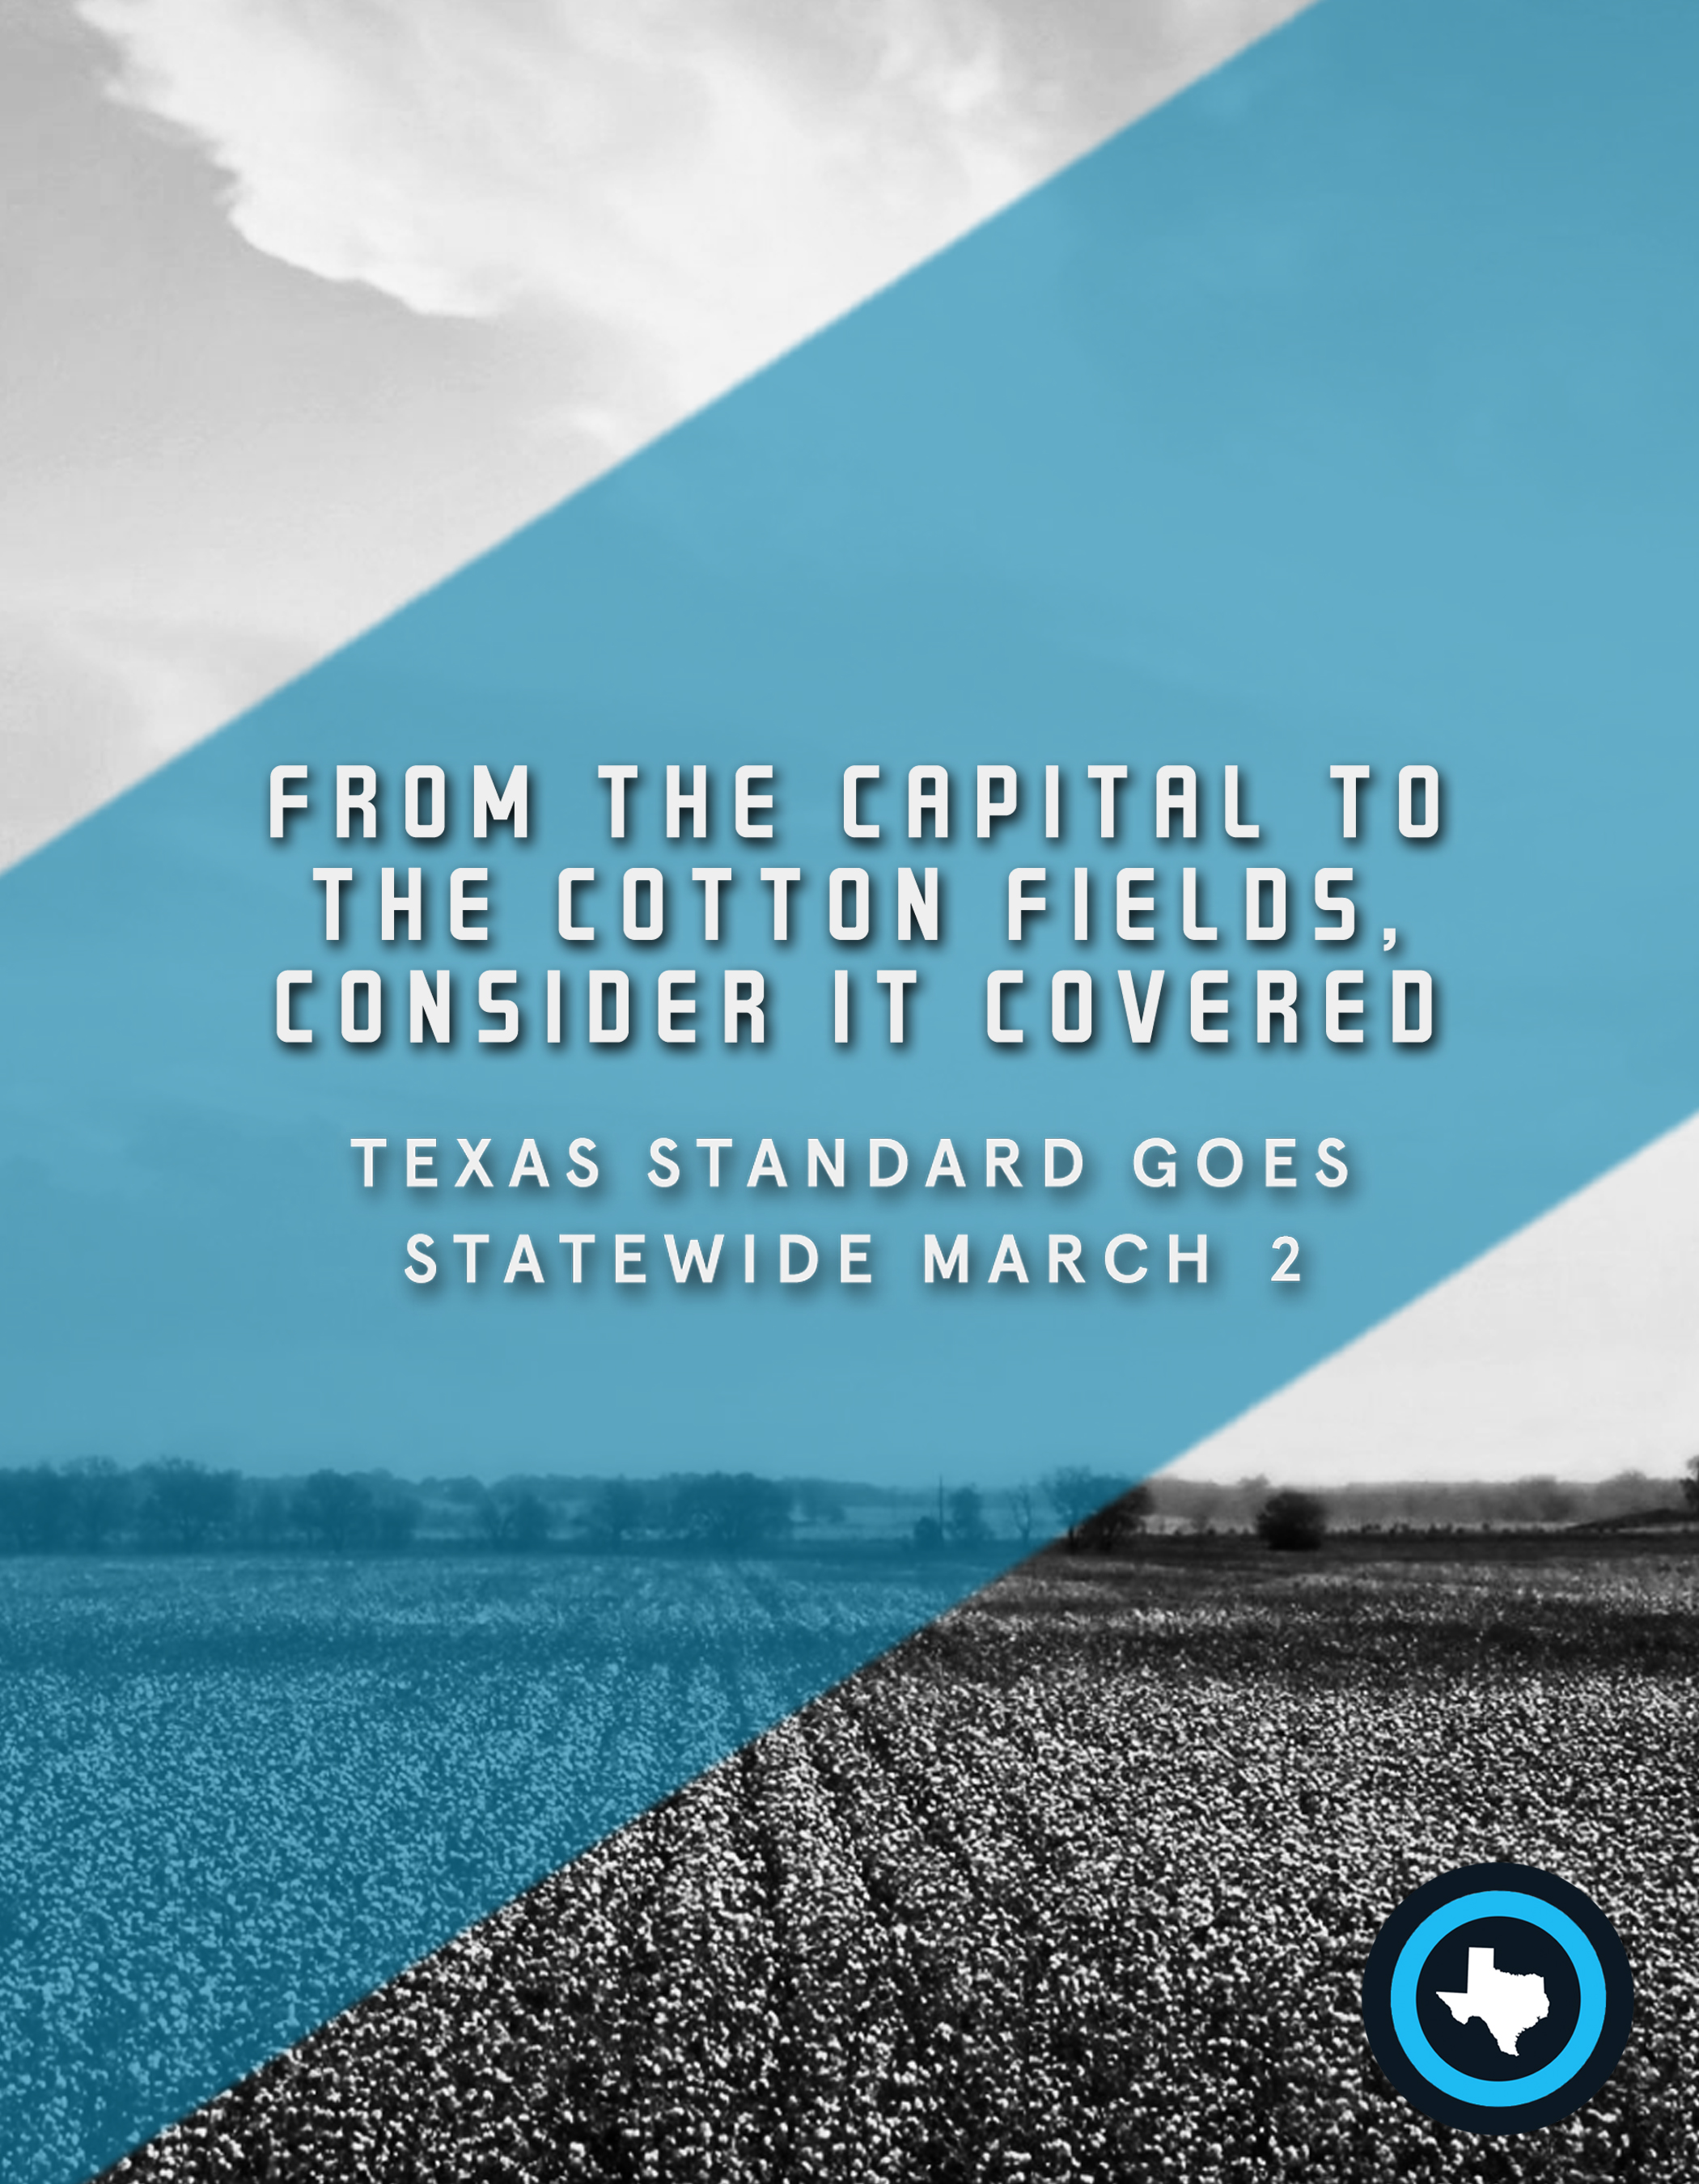 TexasStandard_findyourstation_CottonField_Prep.jpg